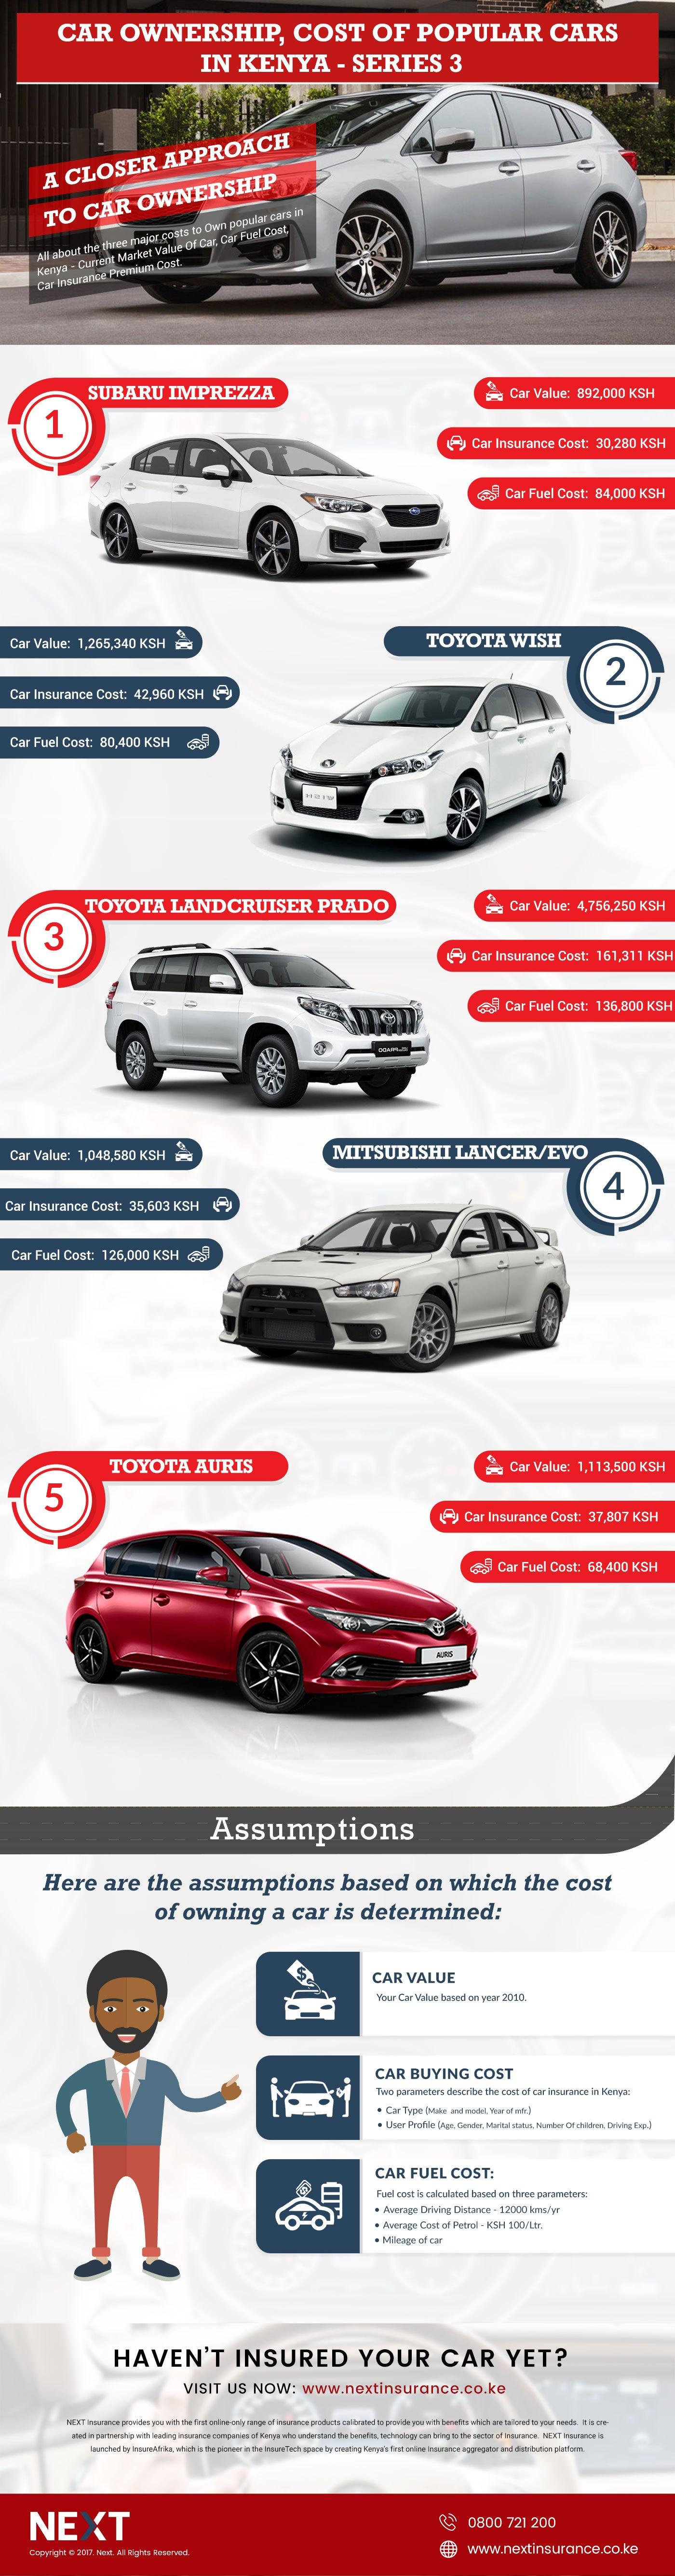 Car Ownership Cost For Popular Cars In Kenya Series 3